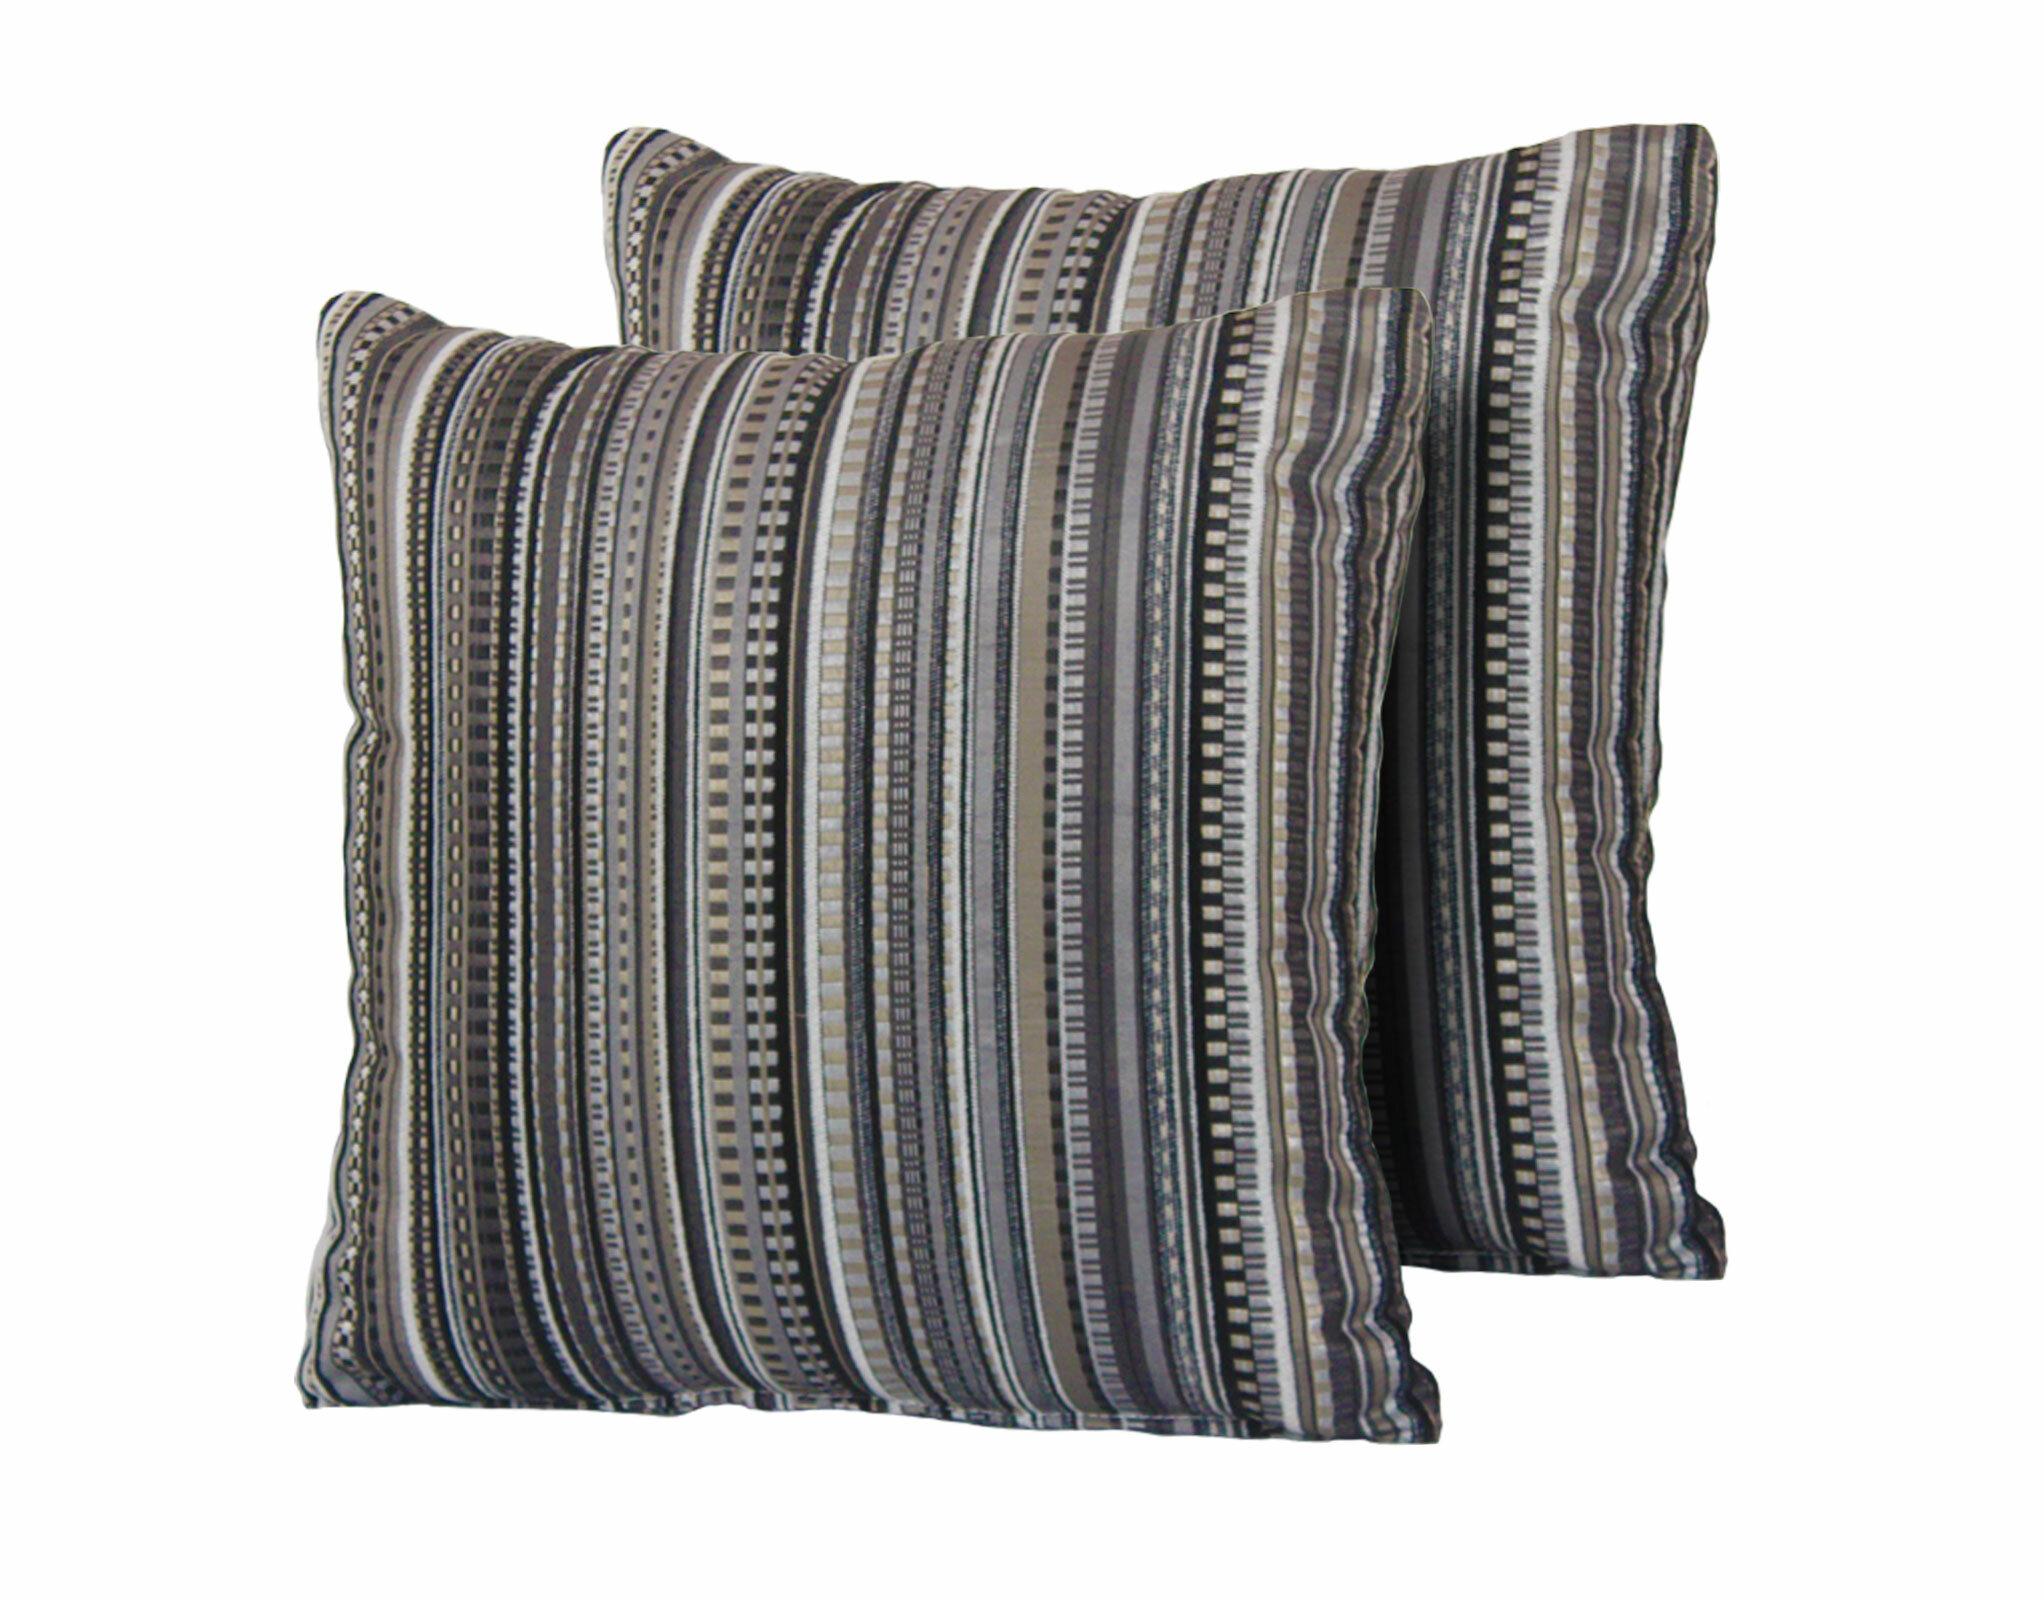 Moravia Stripe Square Outdoor Throw Pillow